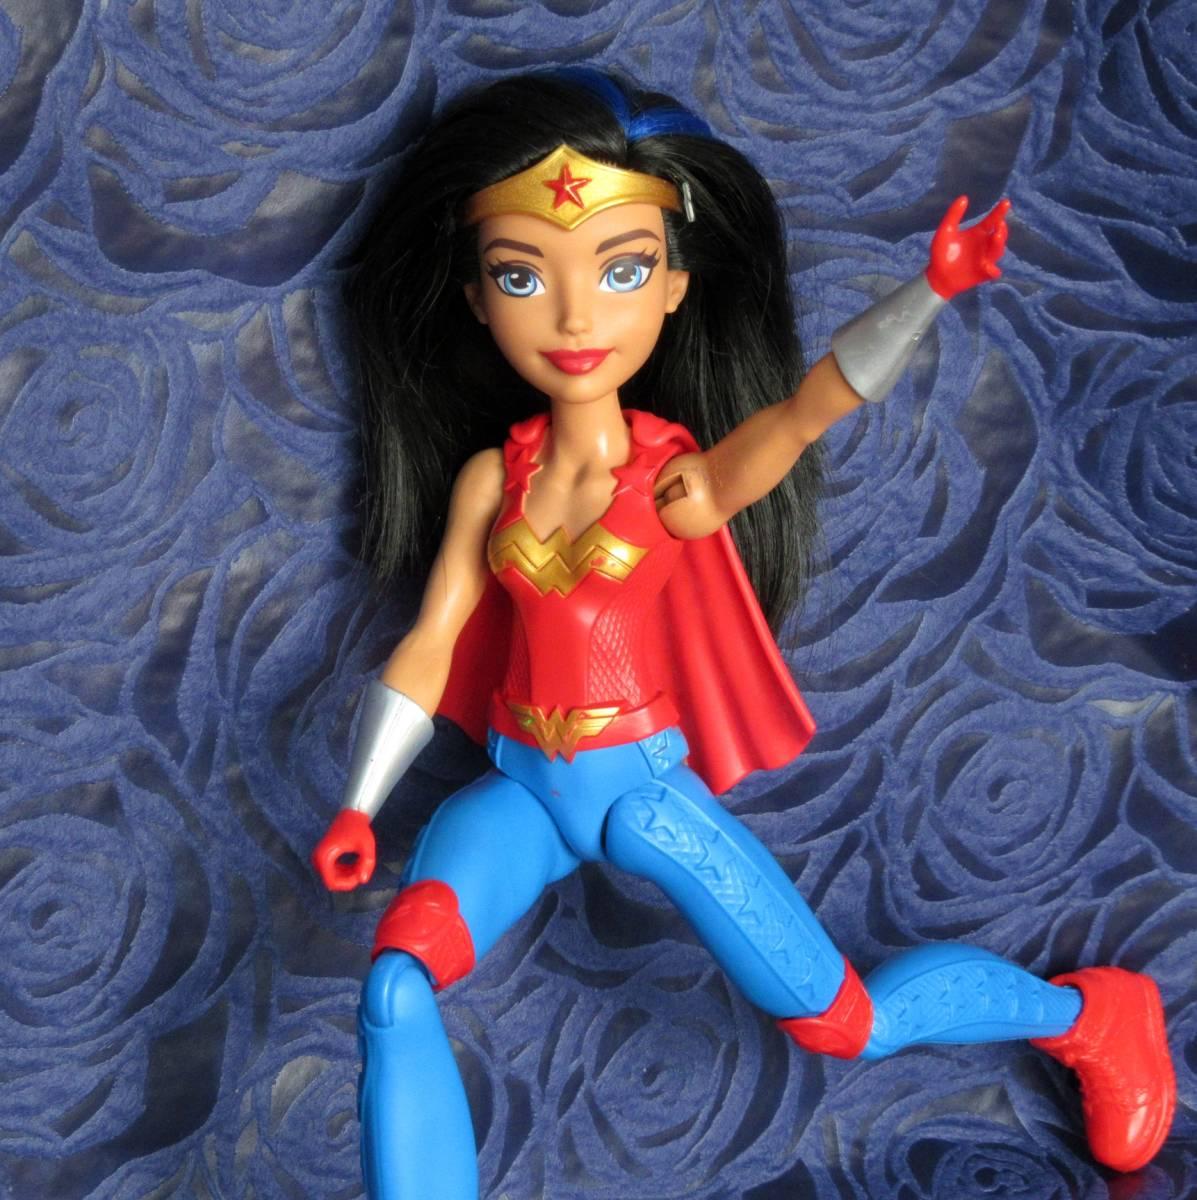 DC Comics DMM24 Super Hero Girls 12 inch Wonder Woman Doll